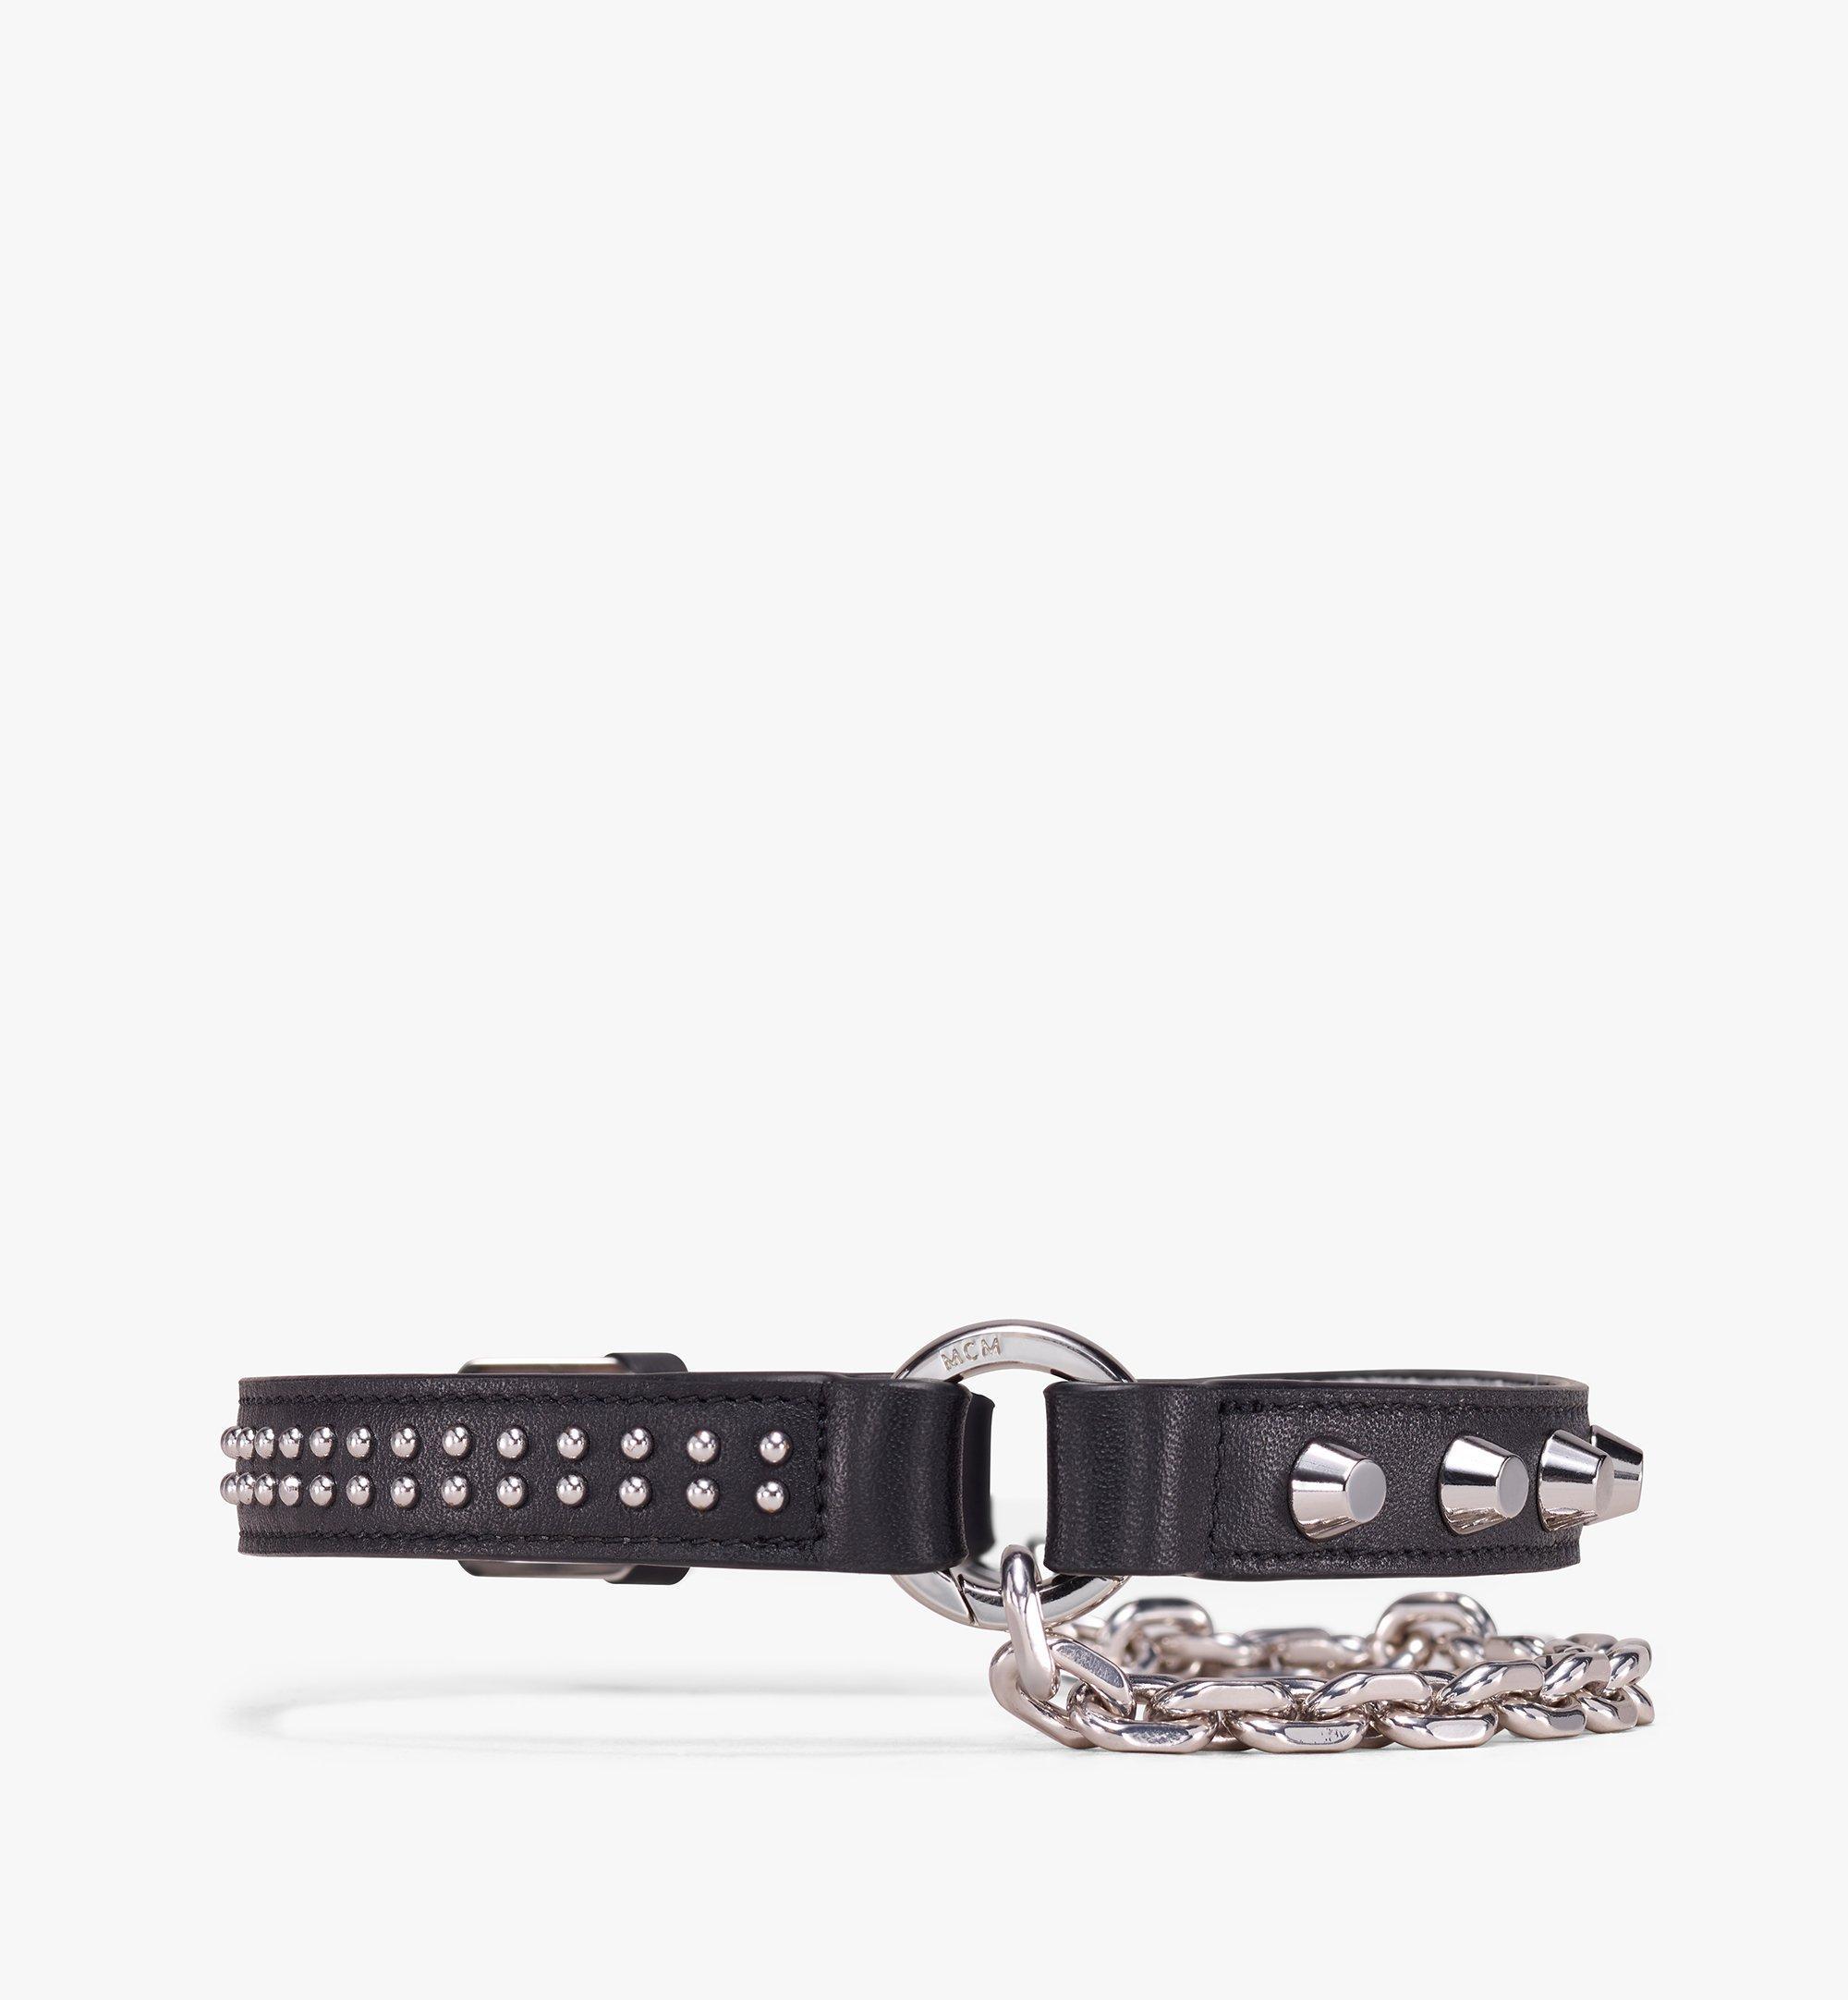 MCM Studded Leather Bracelets With Chain  MEZ9AMM14BK001 Alternate View 2